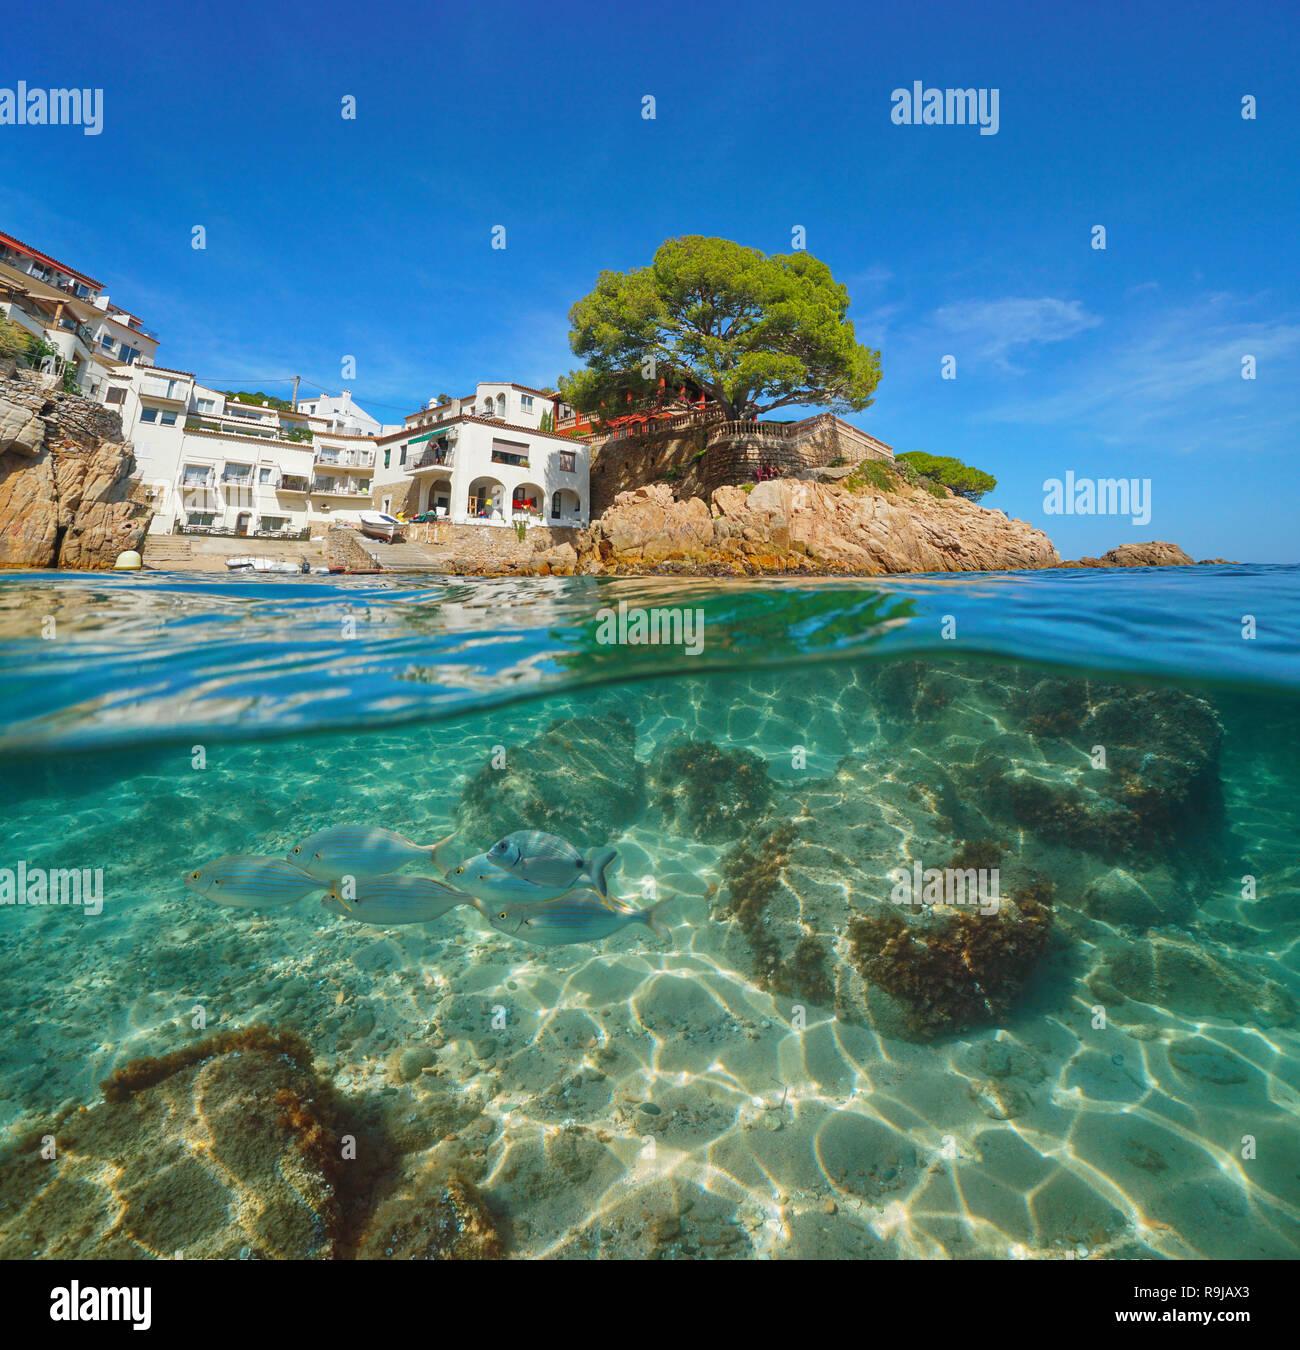 Spain Costa Brava picturesque Mediterranean village and fish underwater, Fornells de Mar, split view half above and below water surface, Begur - Stock Image